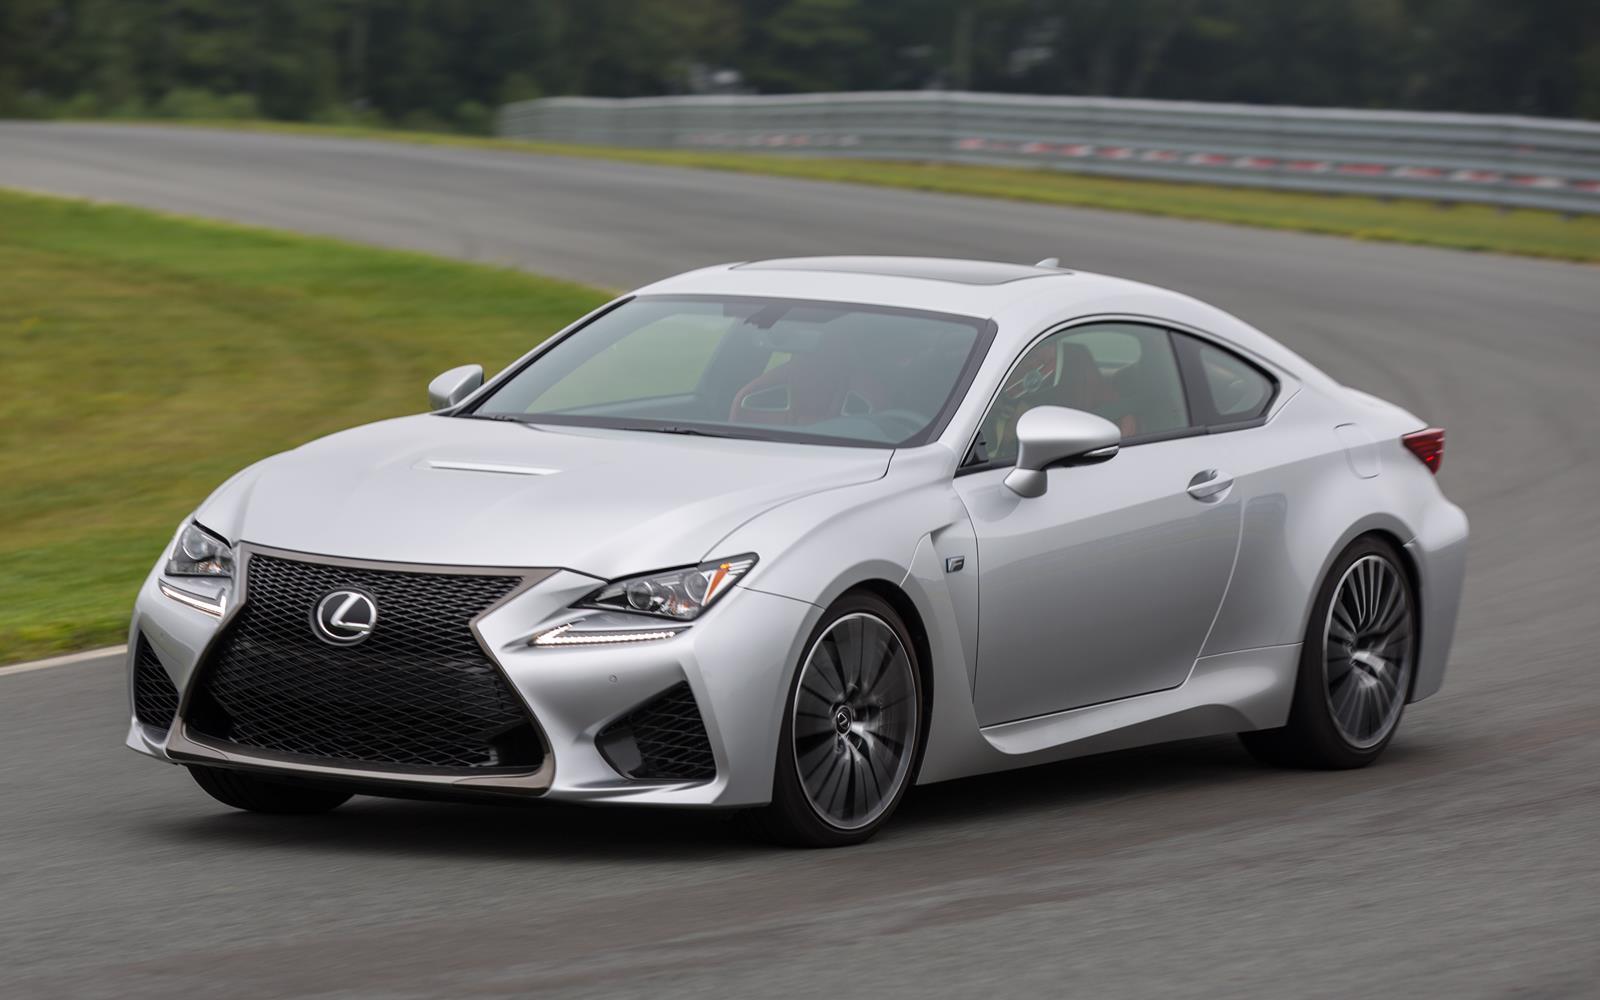 Coming Soon 2015 Lexus RC-F